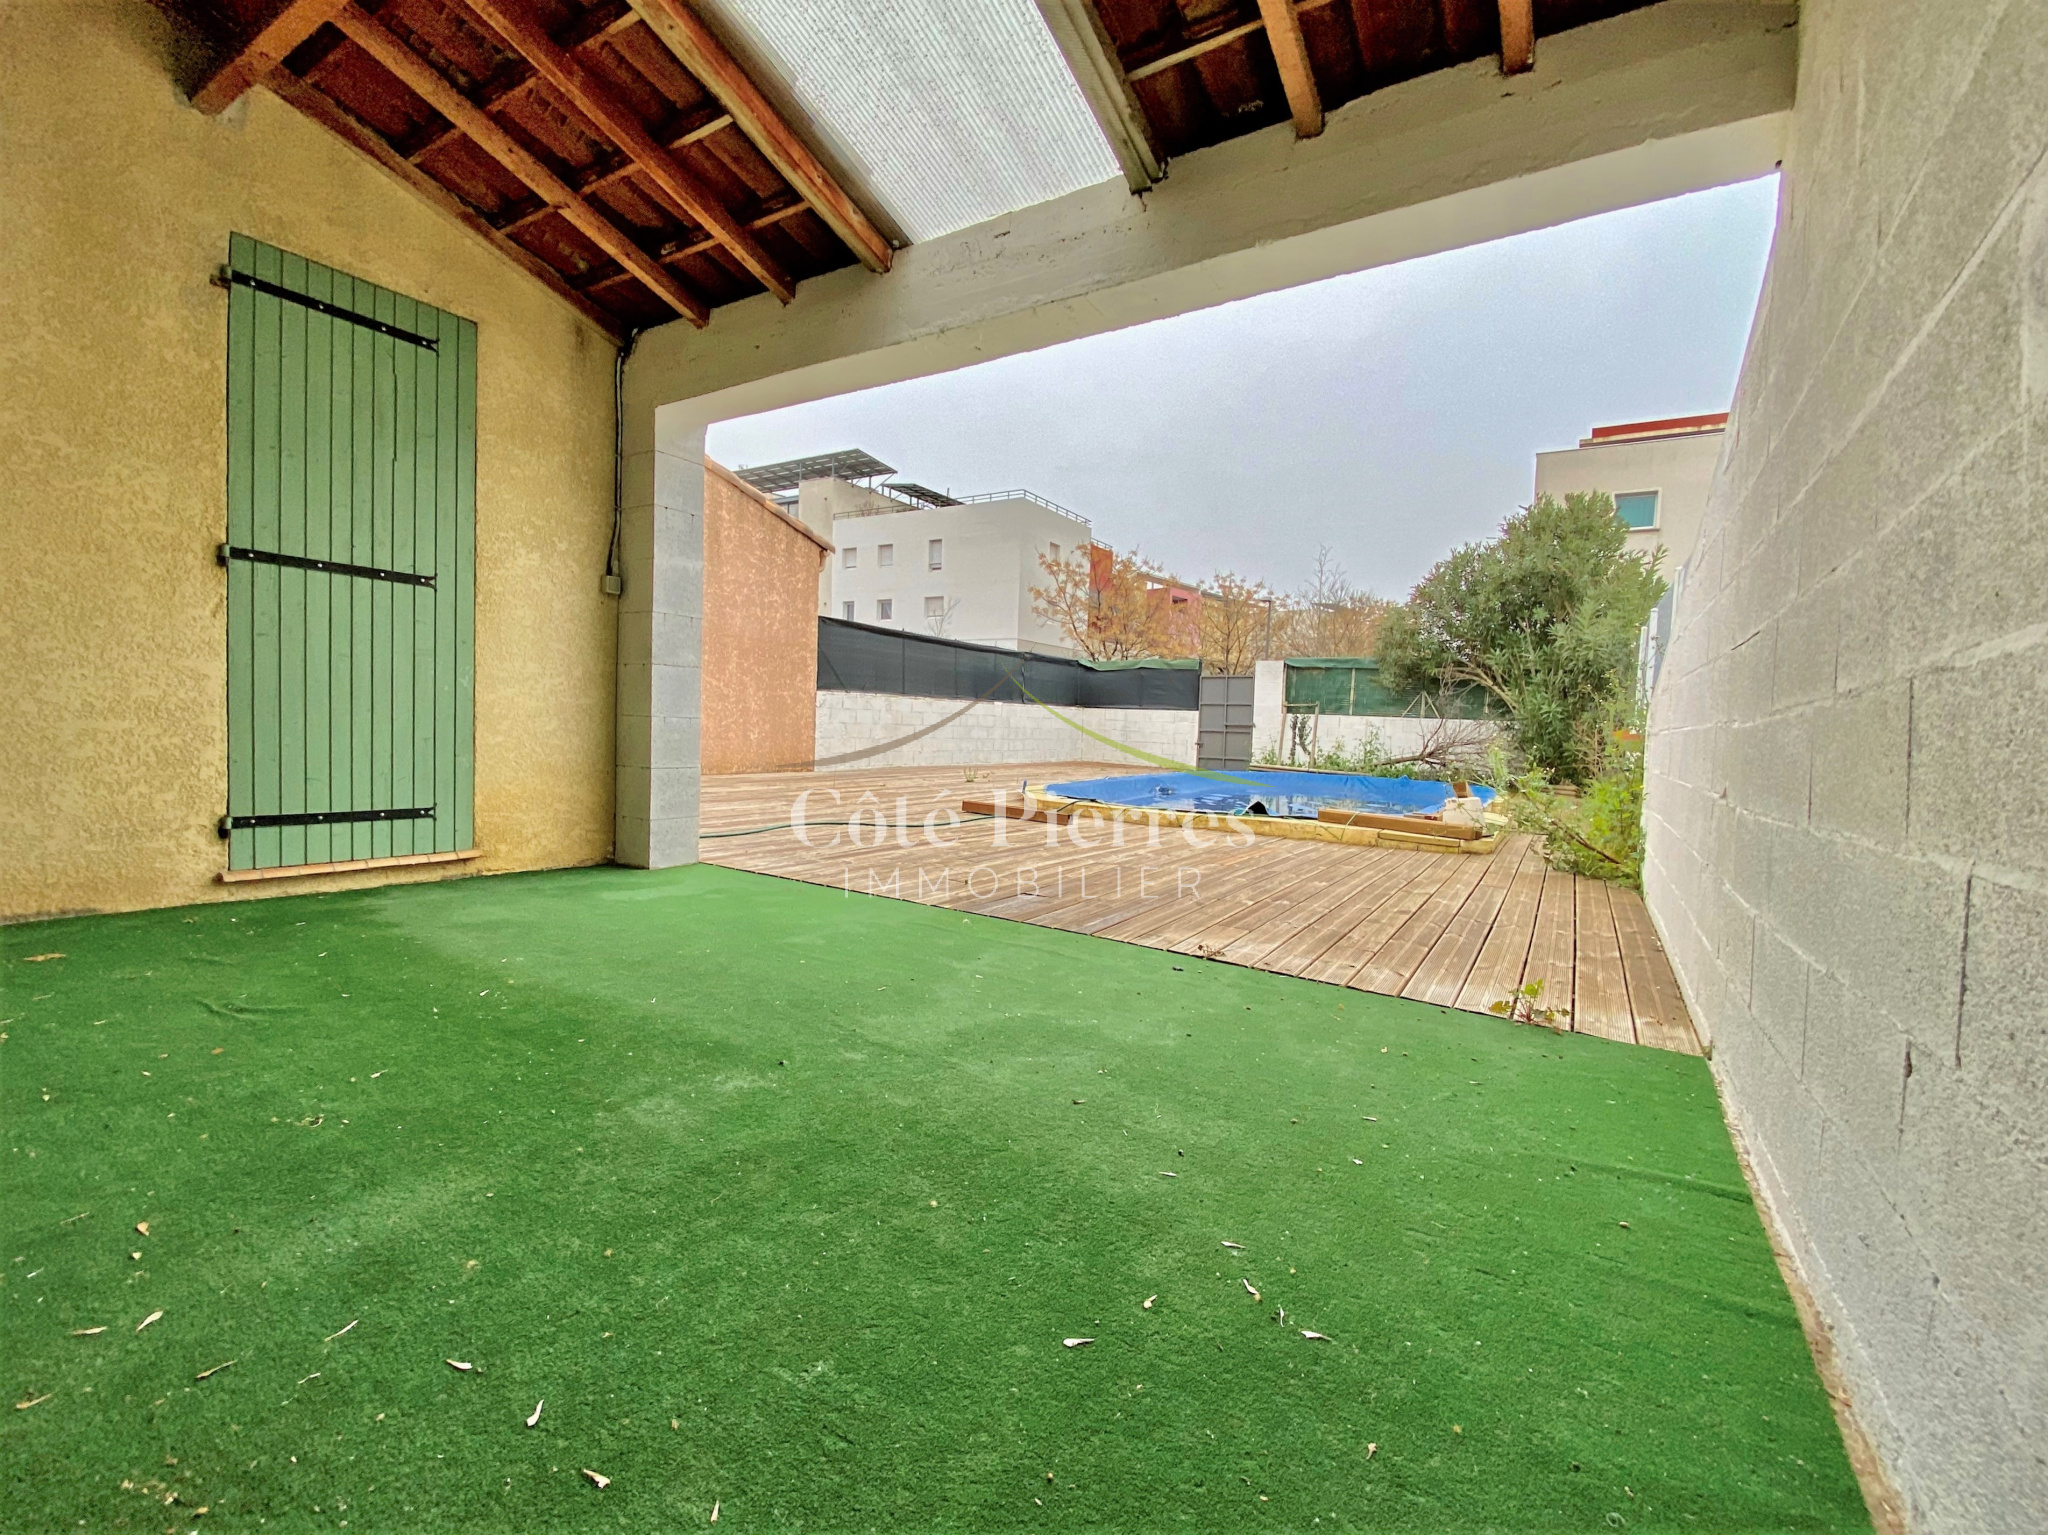 Maison avec Piscine - Montpellier Secteur OVALIE